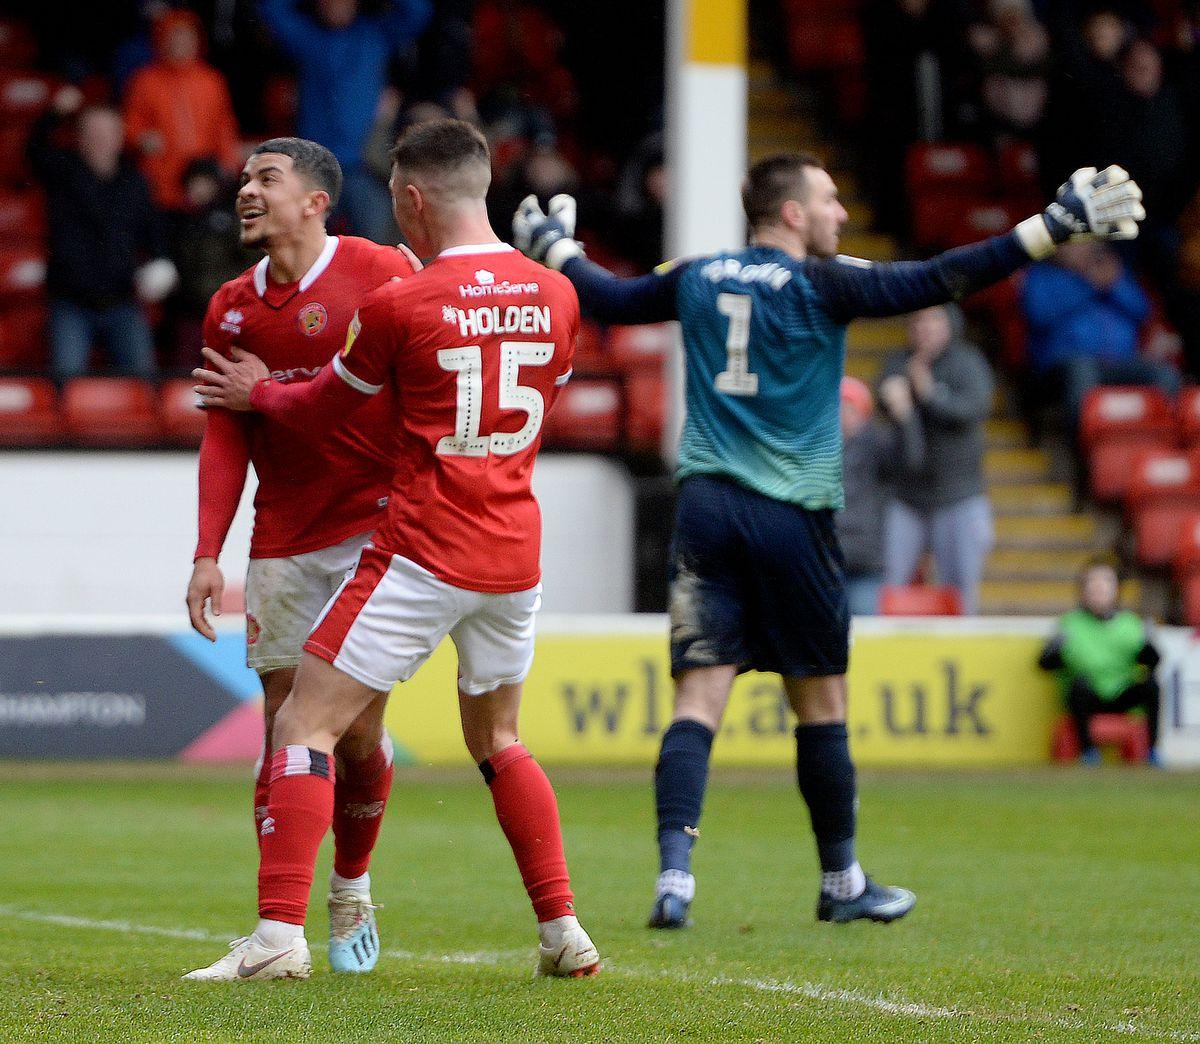 Josh Gordon celebrates his goal against Port Vale